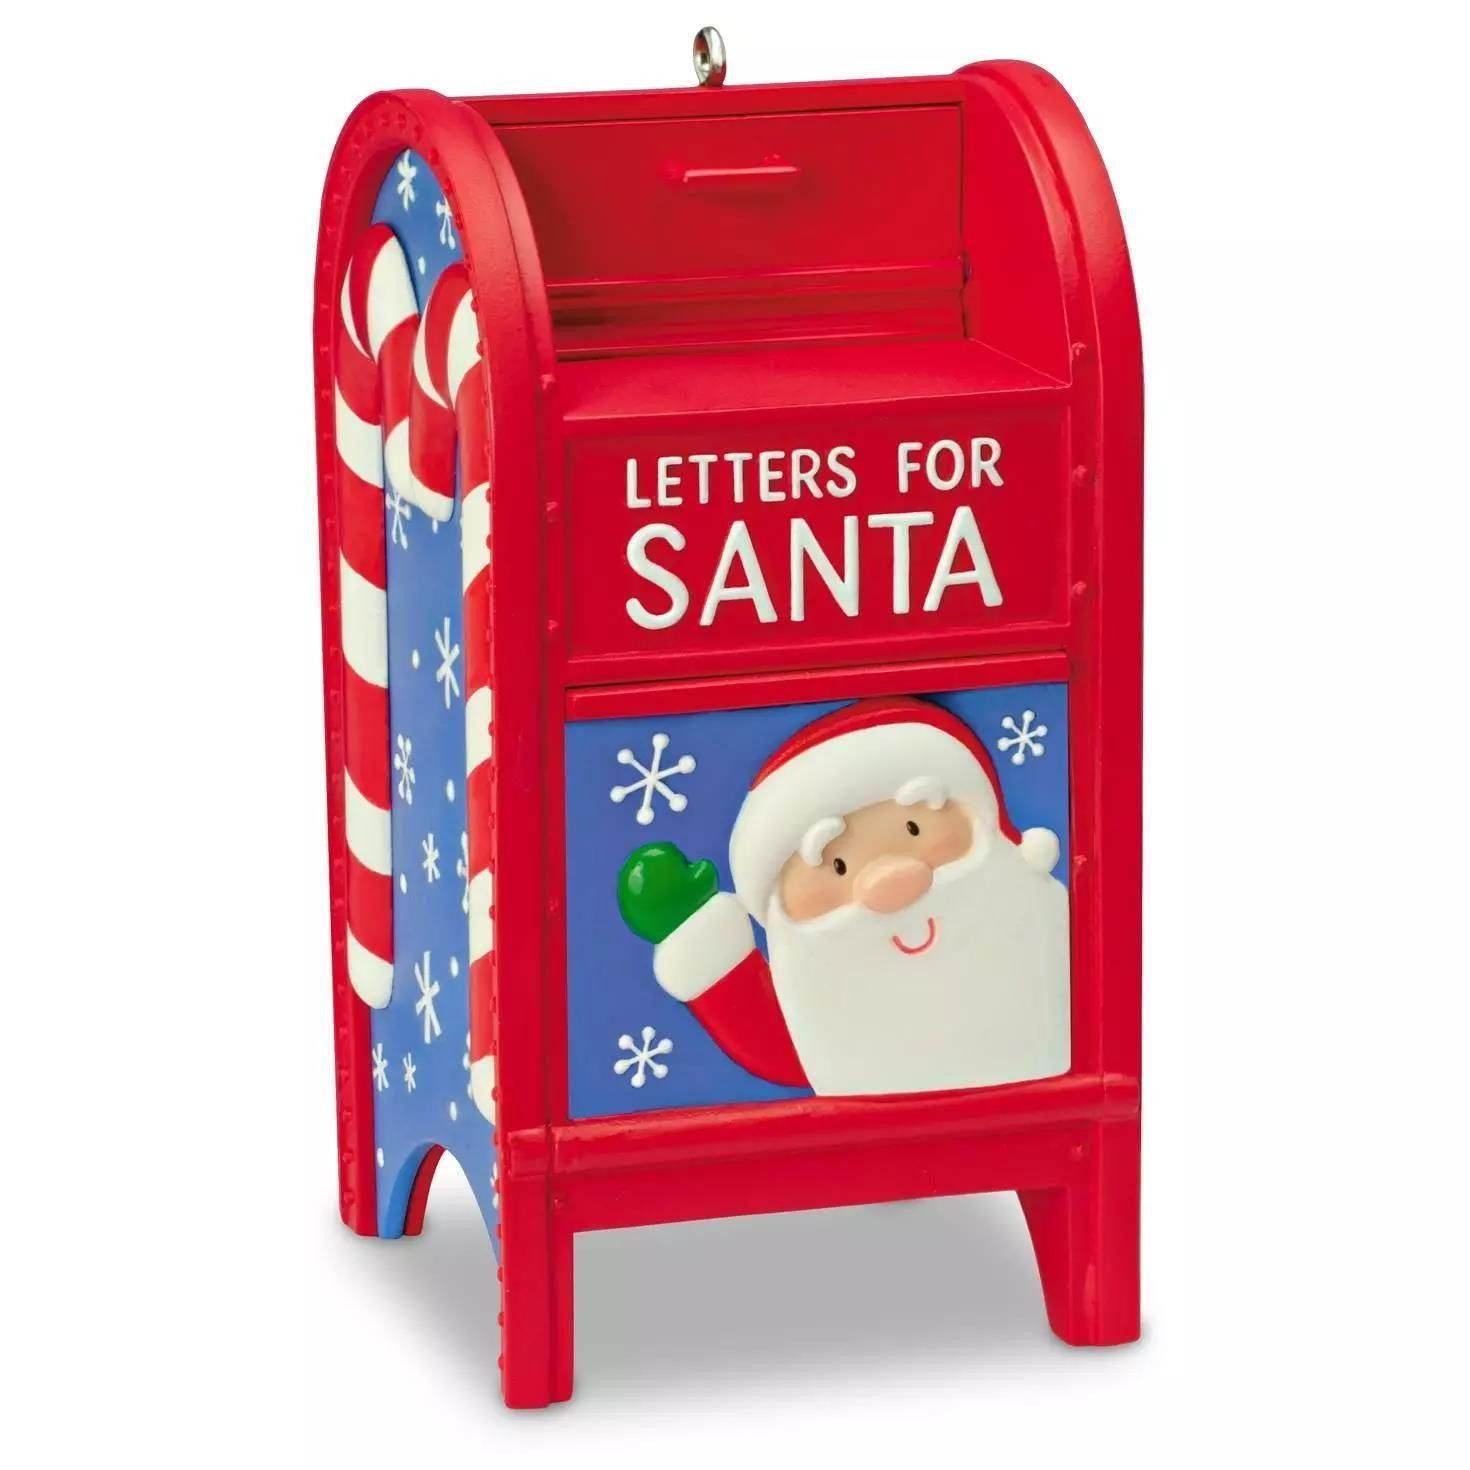 HALLMARK KEEPSAKE Letters For Santa Hallmark ornaments